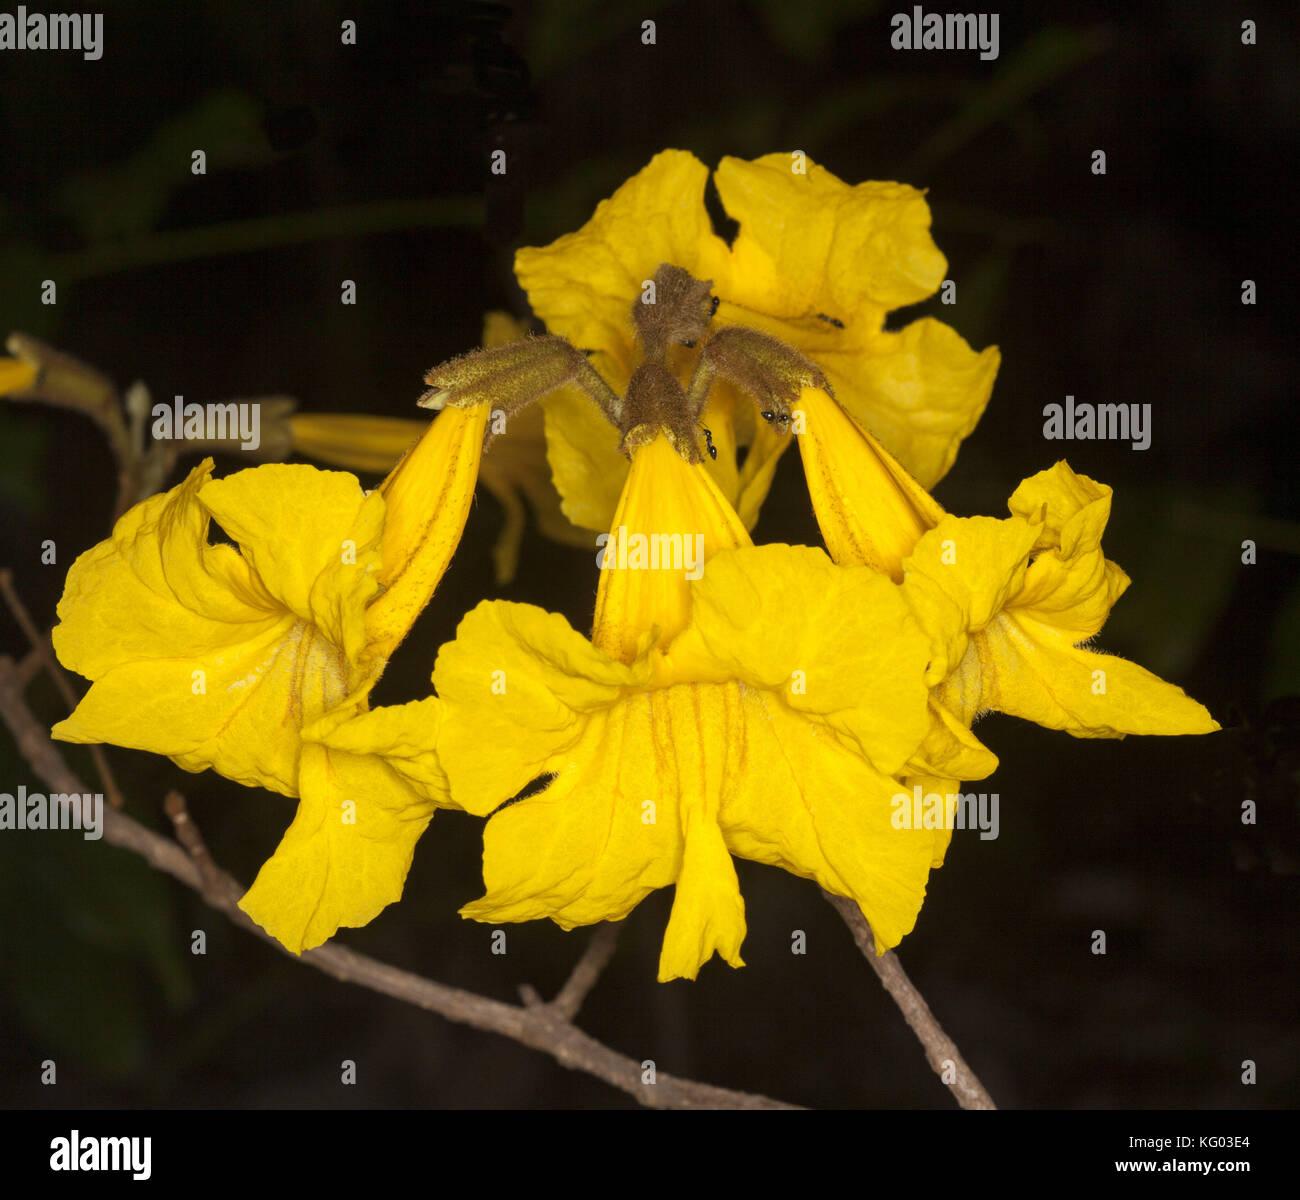 Cluster of golden yellow flowers of tabebuia chrysotricha trumpet cluster of golden yellow flowers of tabebuia chrysotricha trumpet tree on dark background in australian garden mightylinksfo